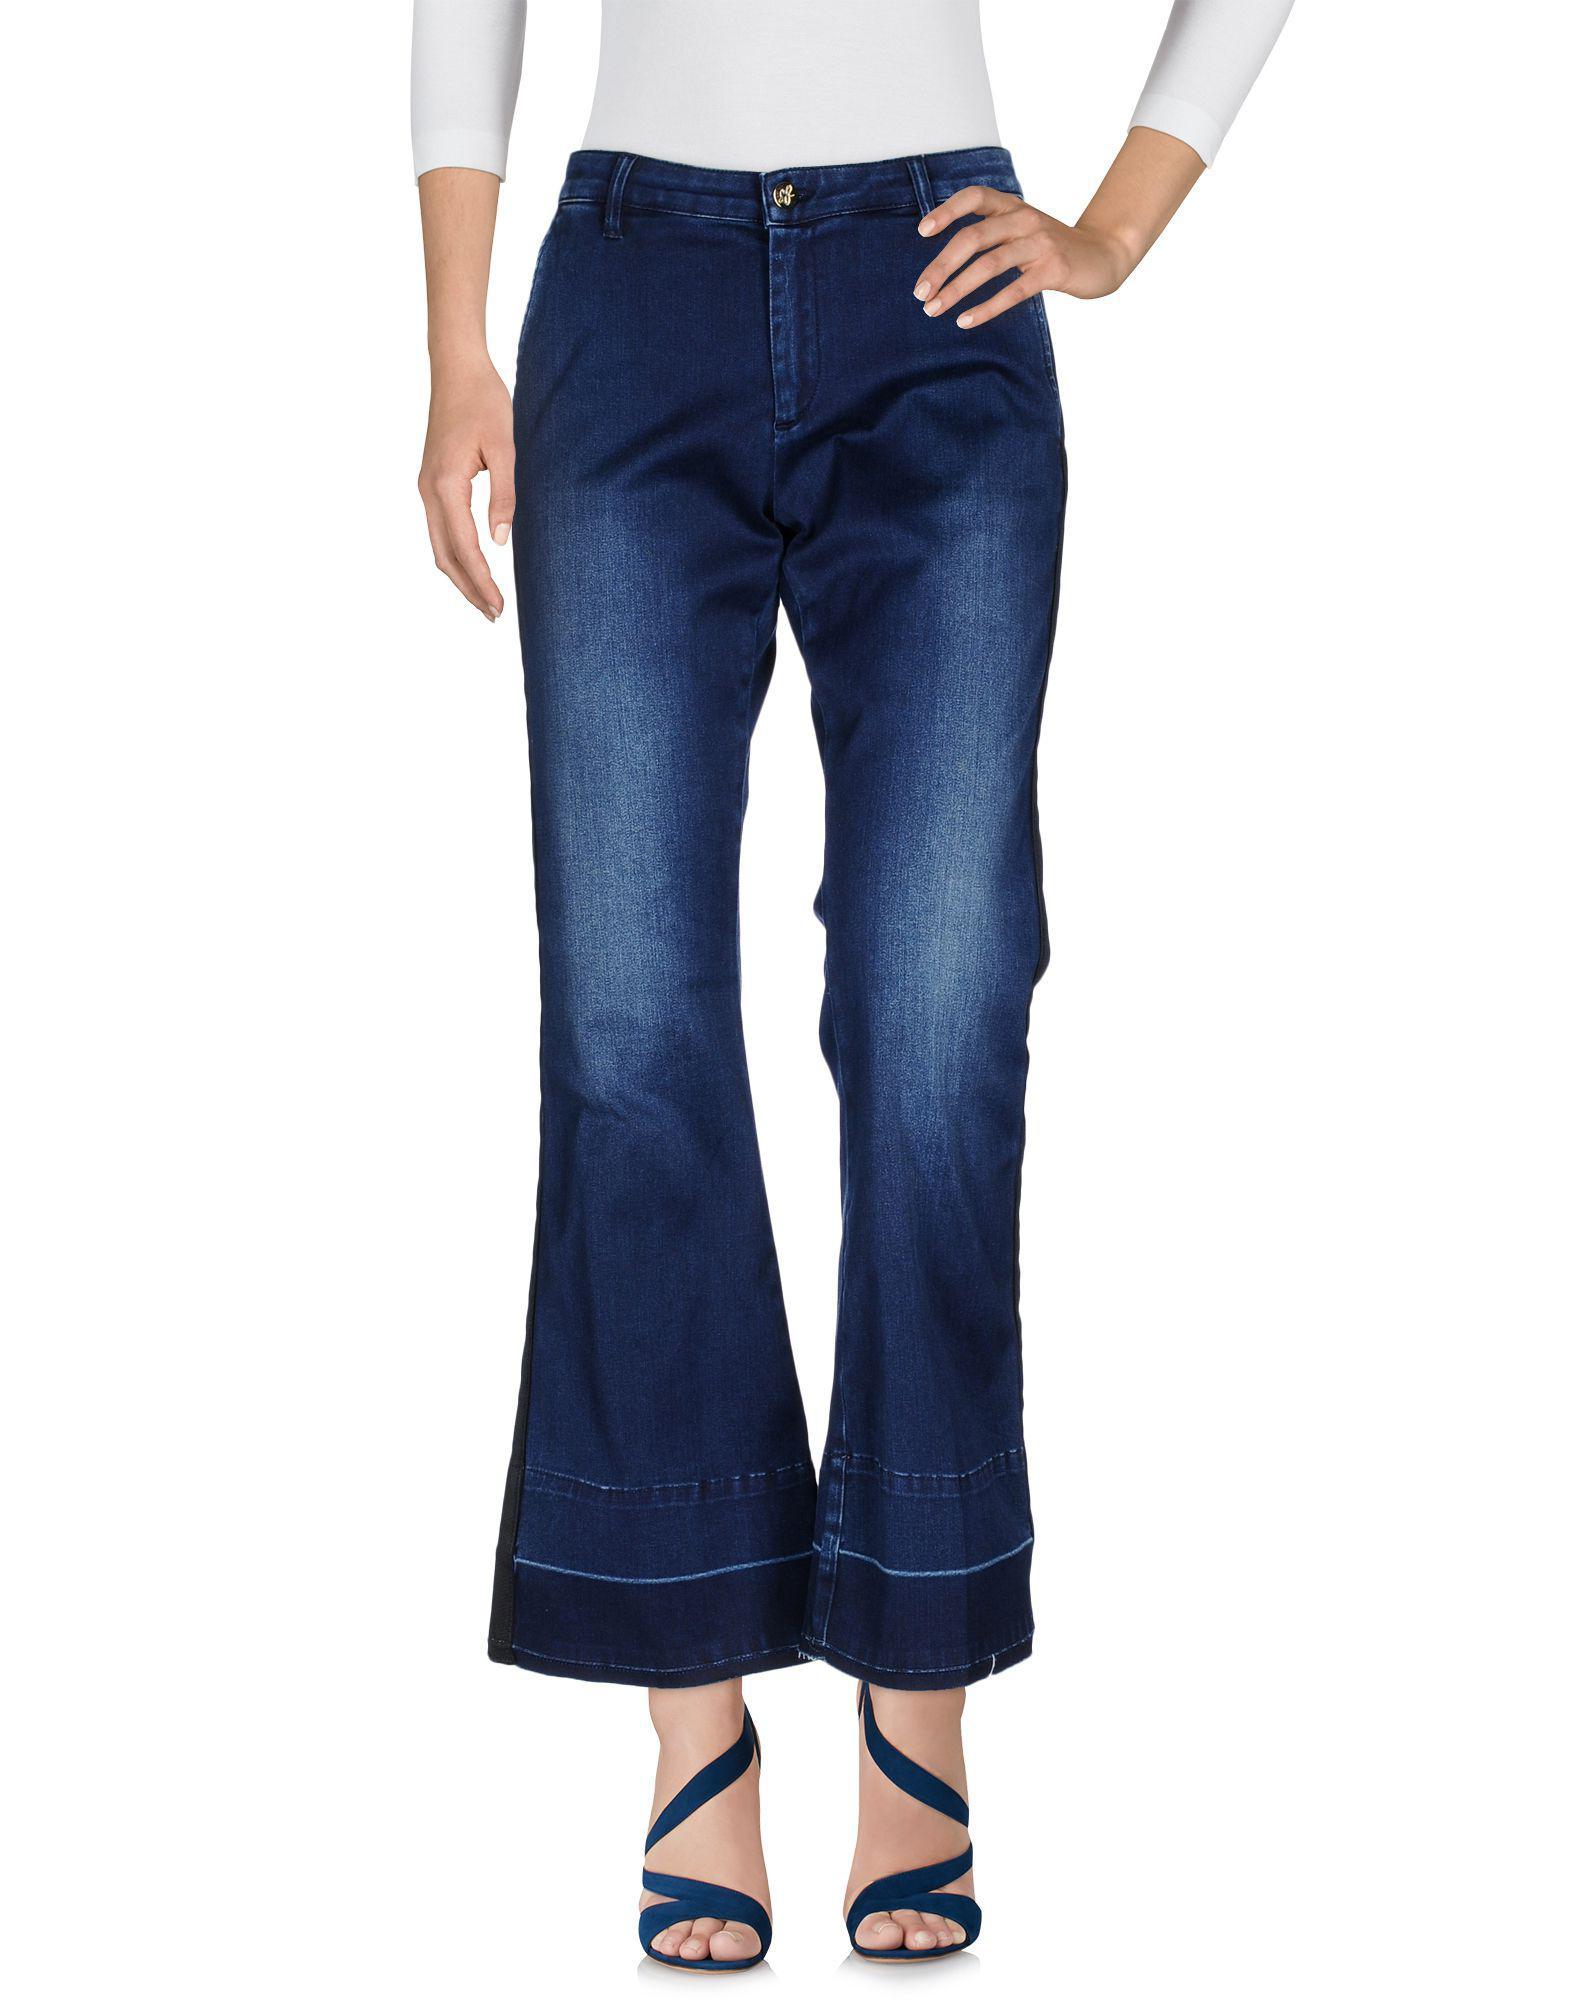 DENIM - Denim trousers Beatrice. B New Lower Prices Discount Wholesale Discount Comfortable Sale Fake Cheap Original b0znAIe6